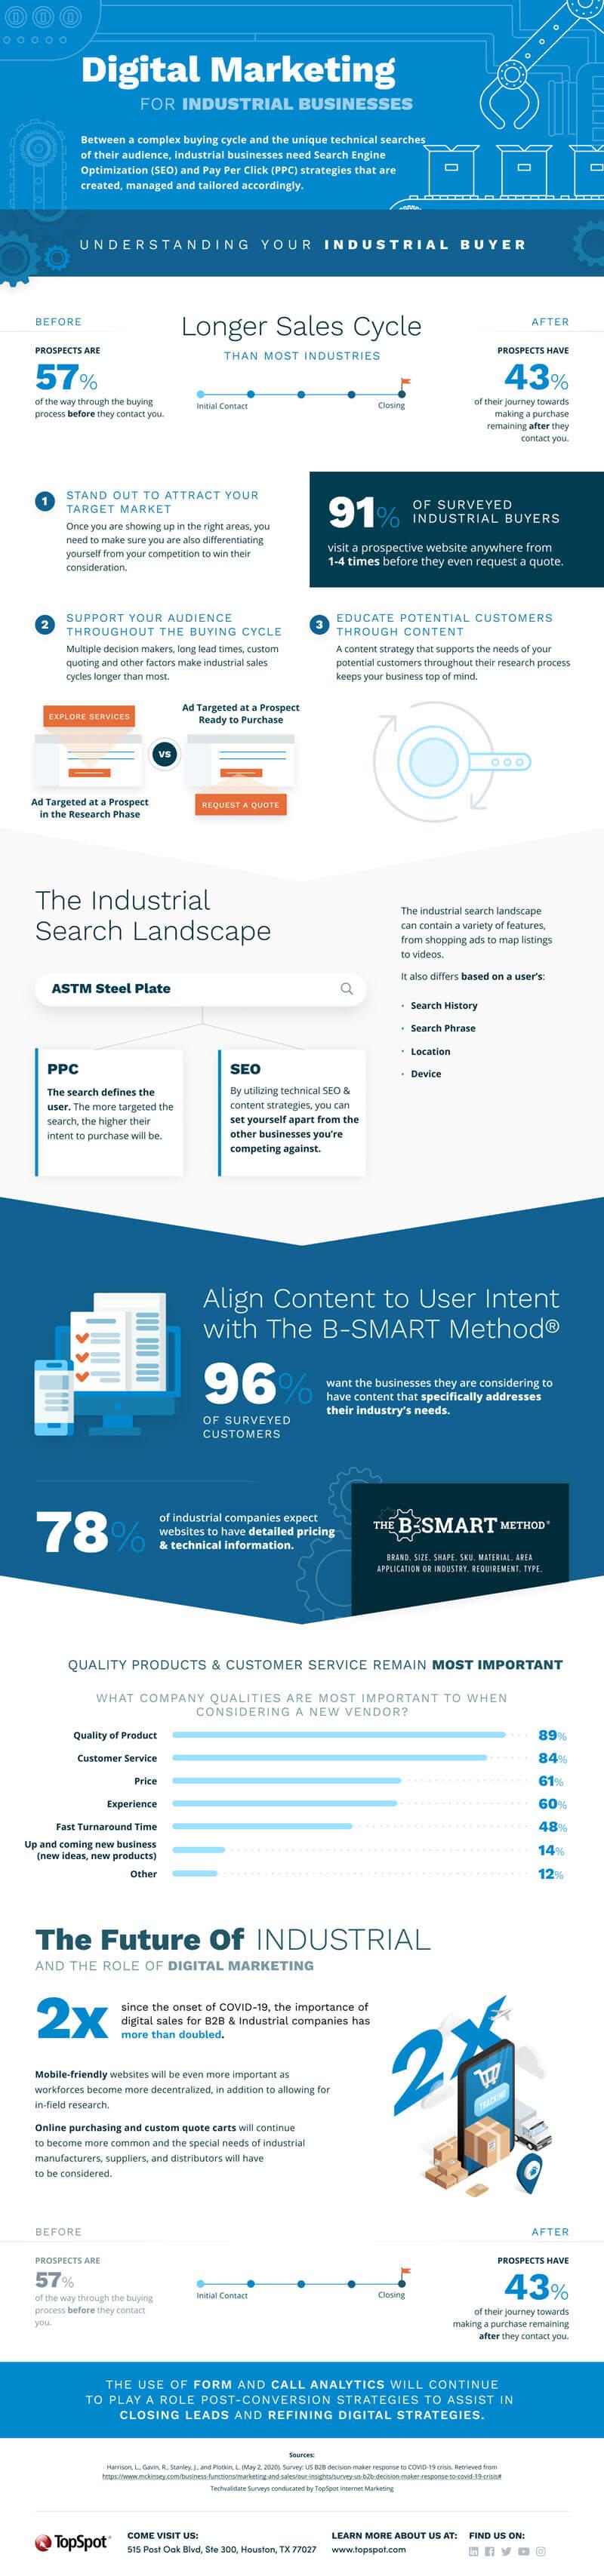 Digital Marketing for Industrial Companies #infographic #Digital Marketing #Business #infographics #Industrial Companies #Infographic